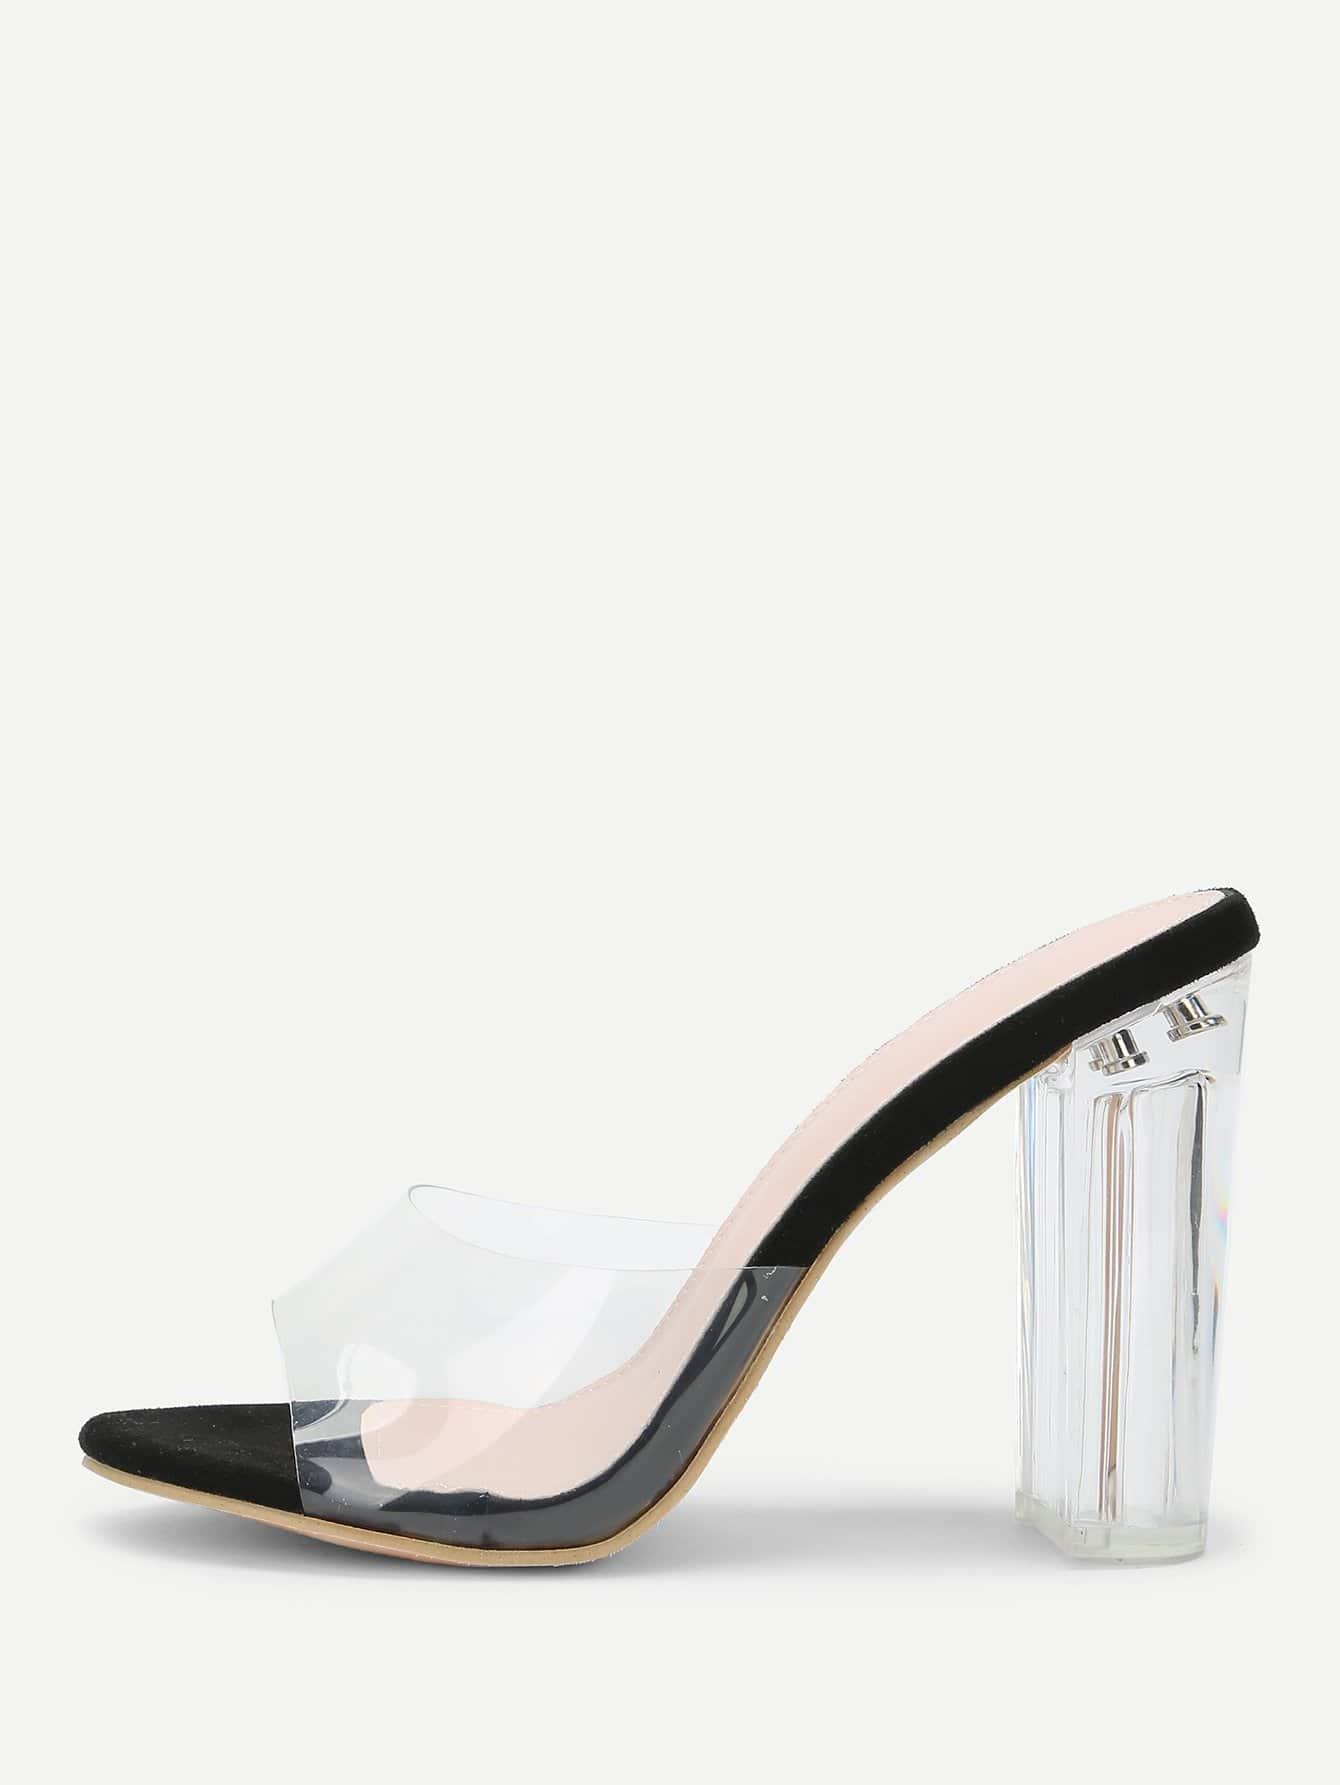 Clear Design Block Heeled Pumps rhinestone design block heeled pumps